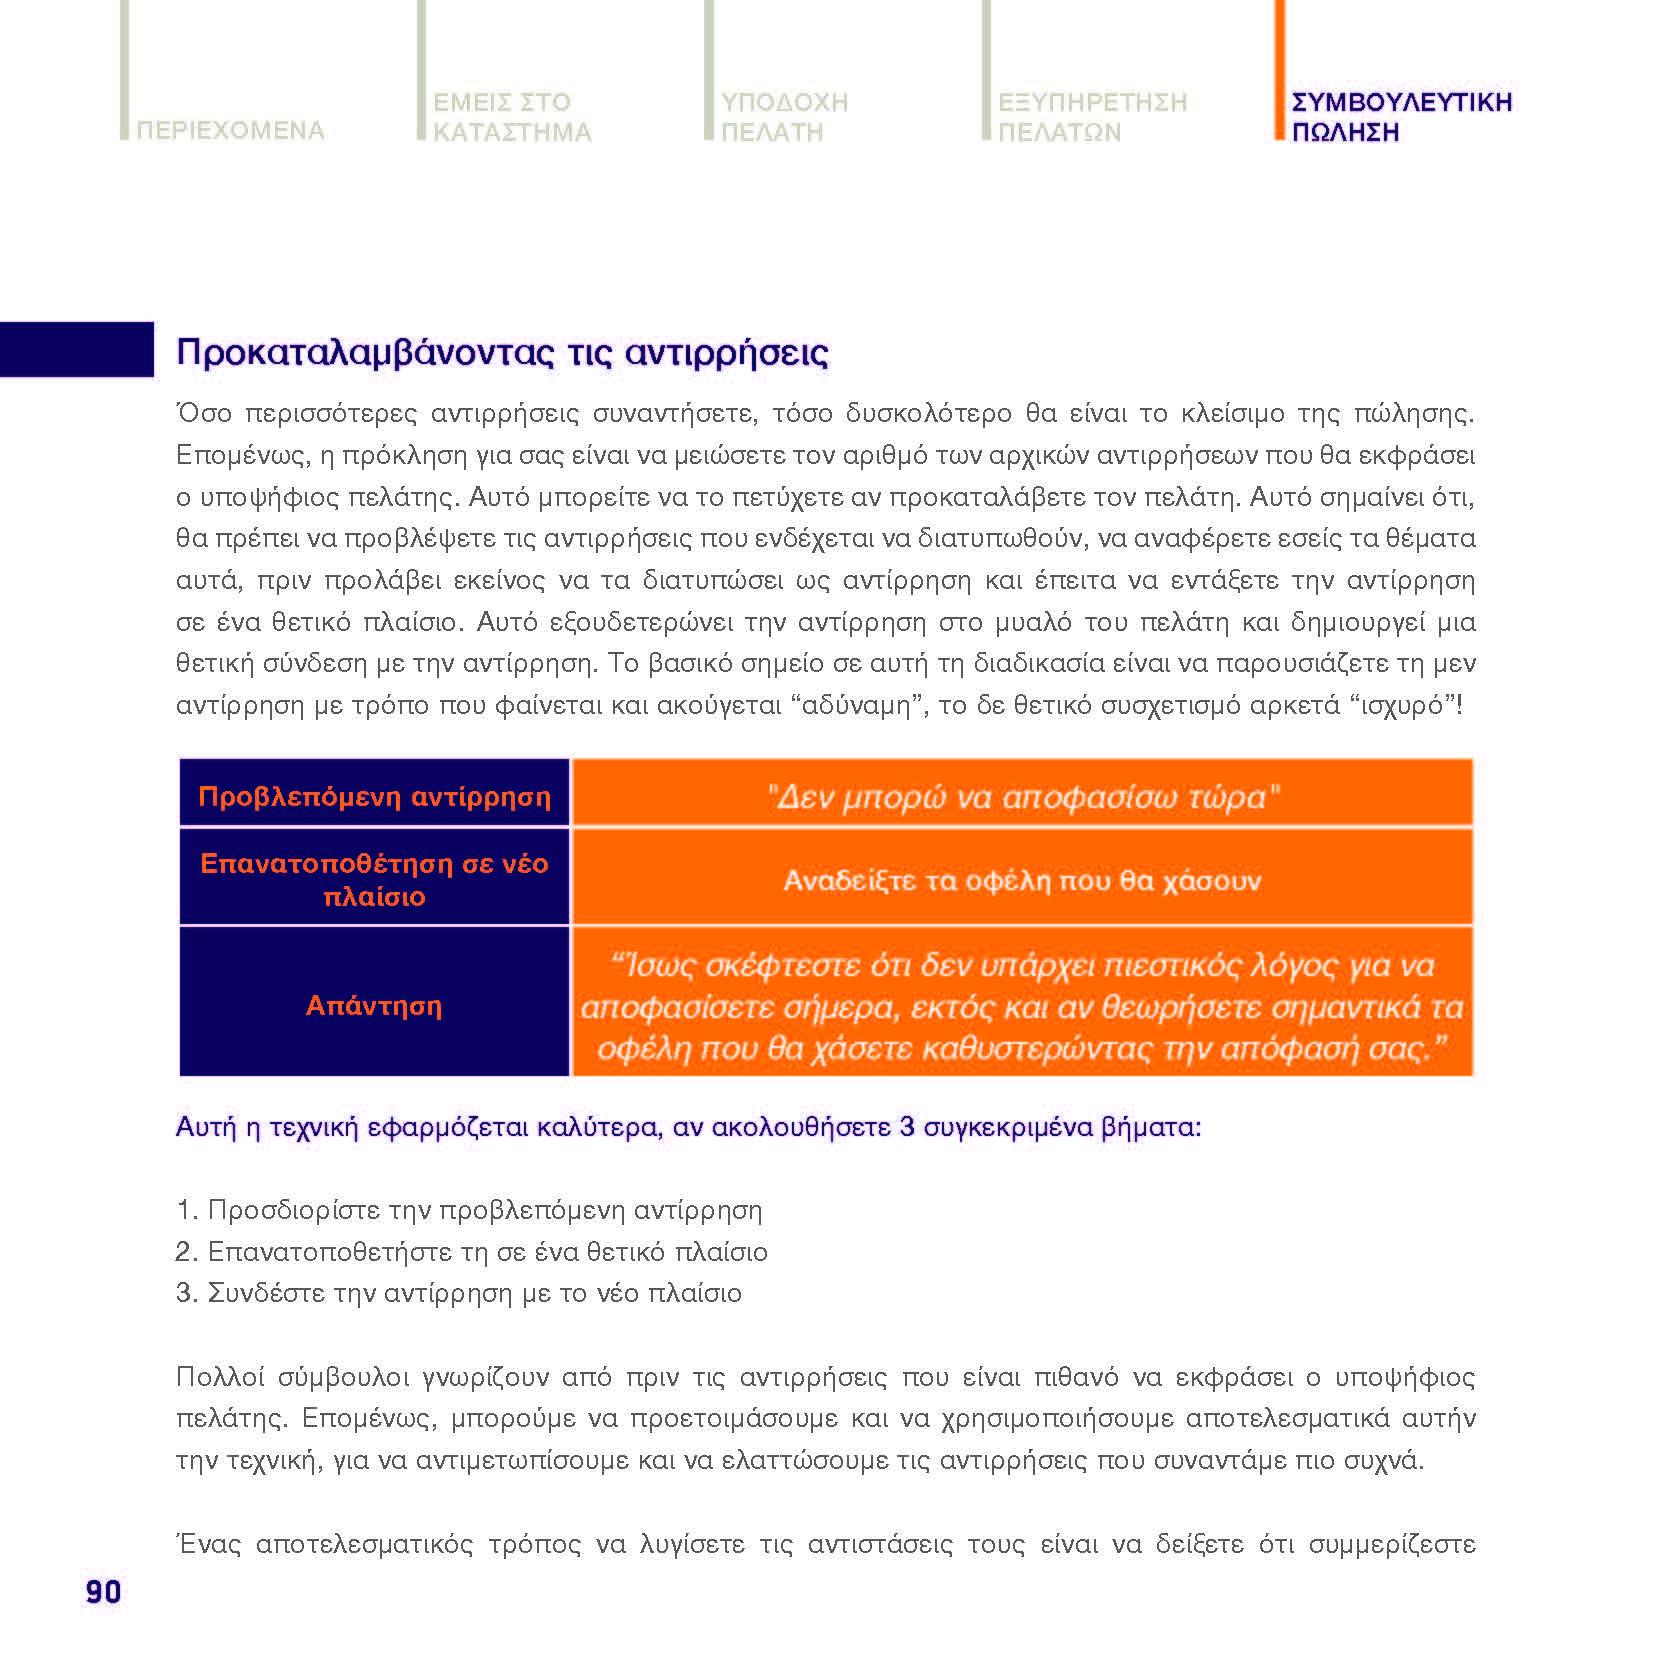 https://www.jib.gr/wp-content/uploads/2020/09/OPTIMA-BANK-BOOKLET-WEB_Page_090.jpg